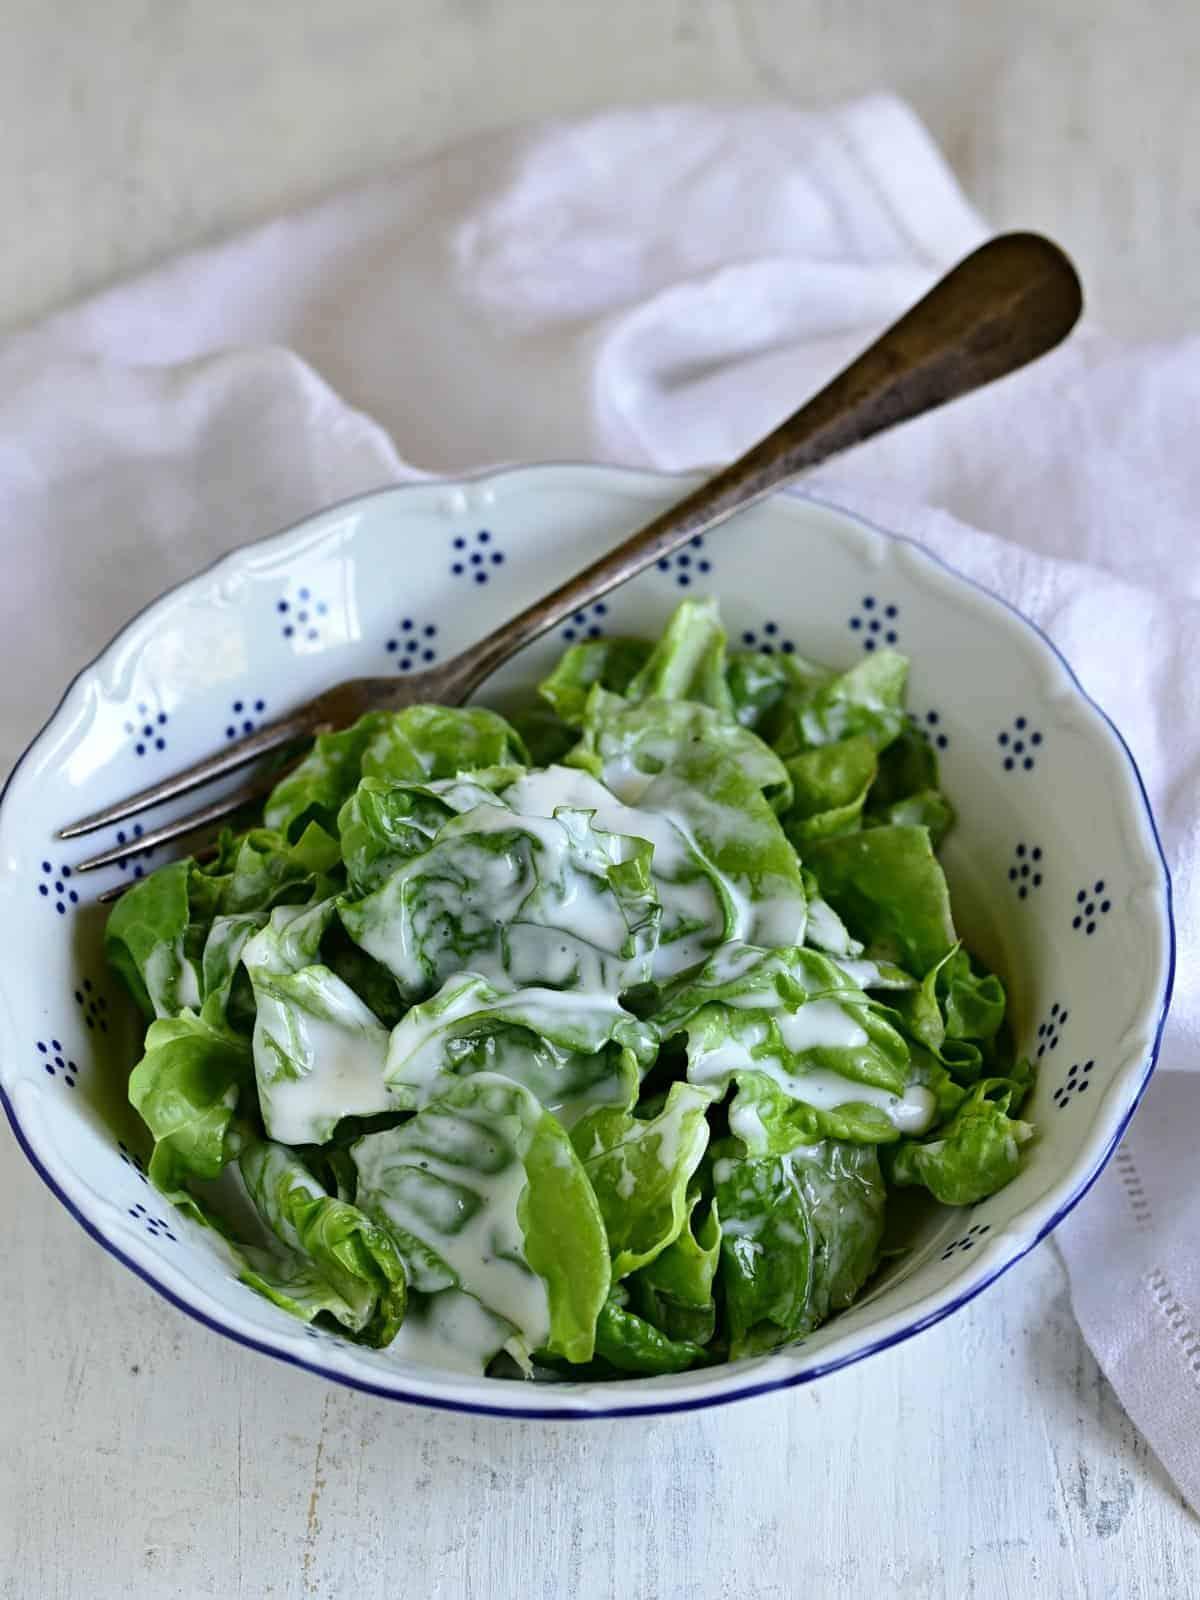 head lettuce with buttermilk dressing czech hlávkový salát s kefírem